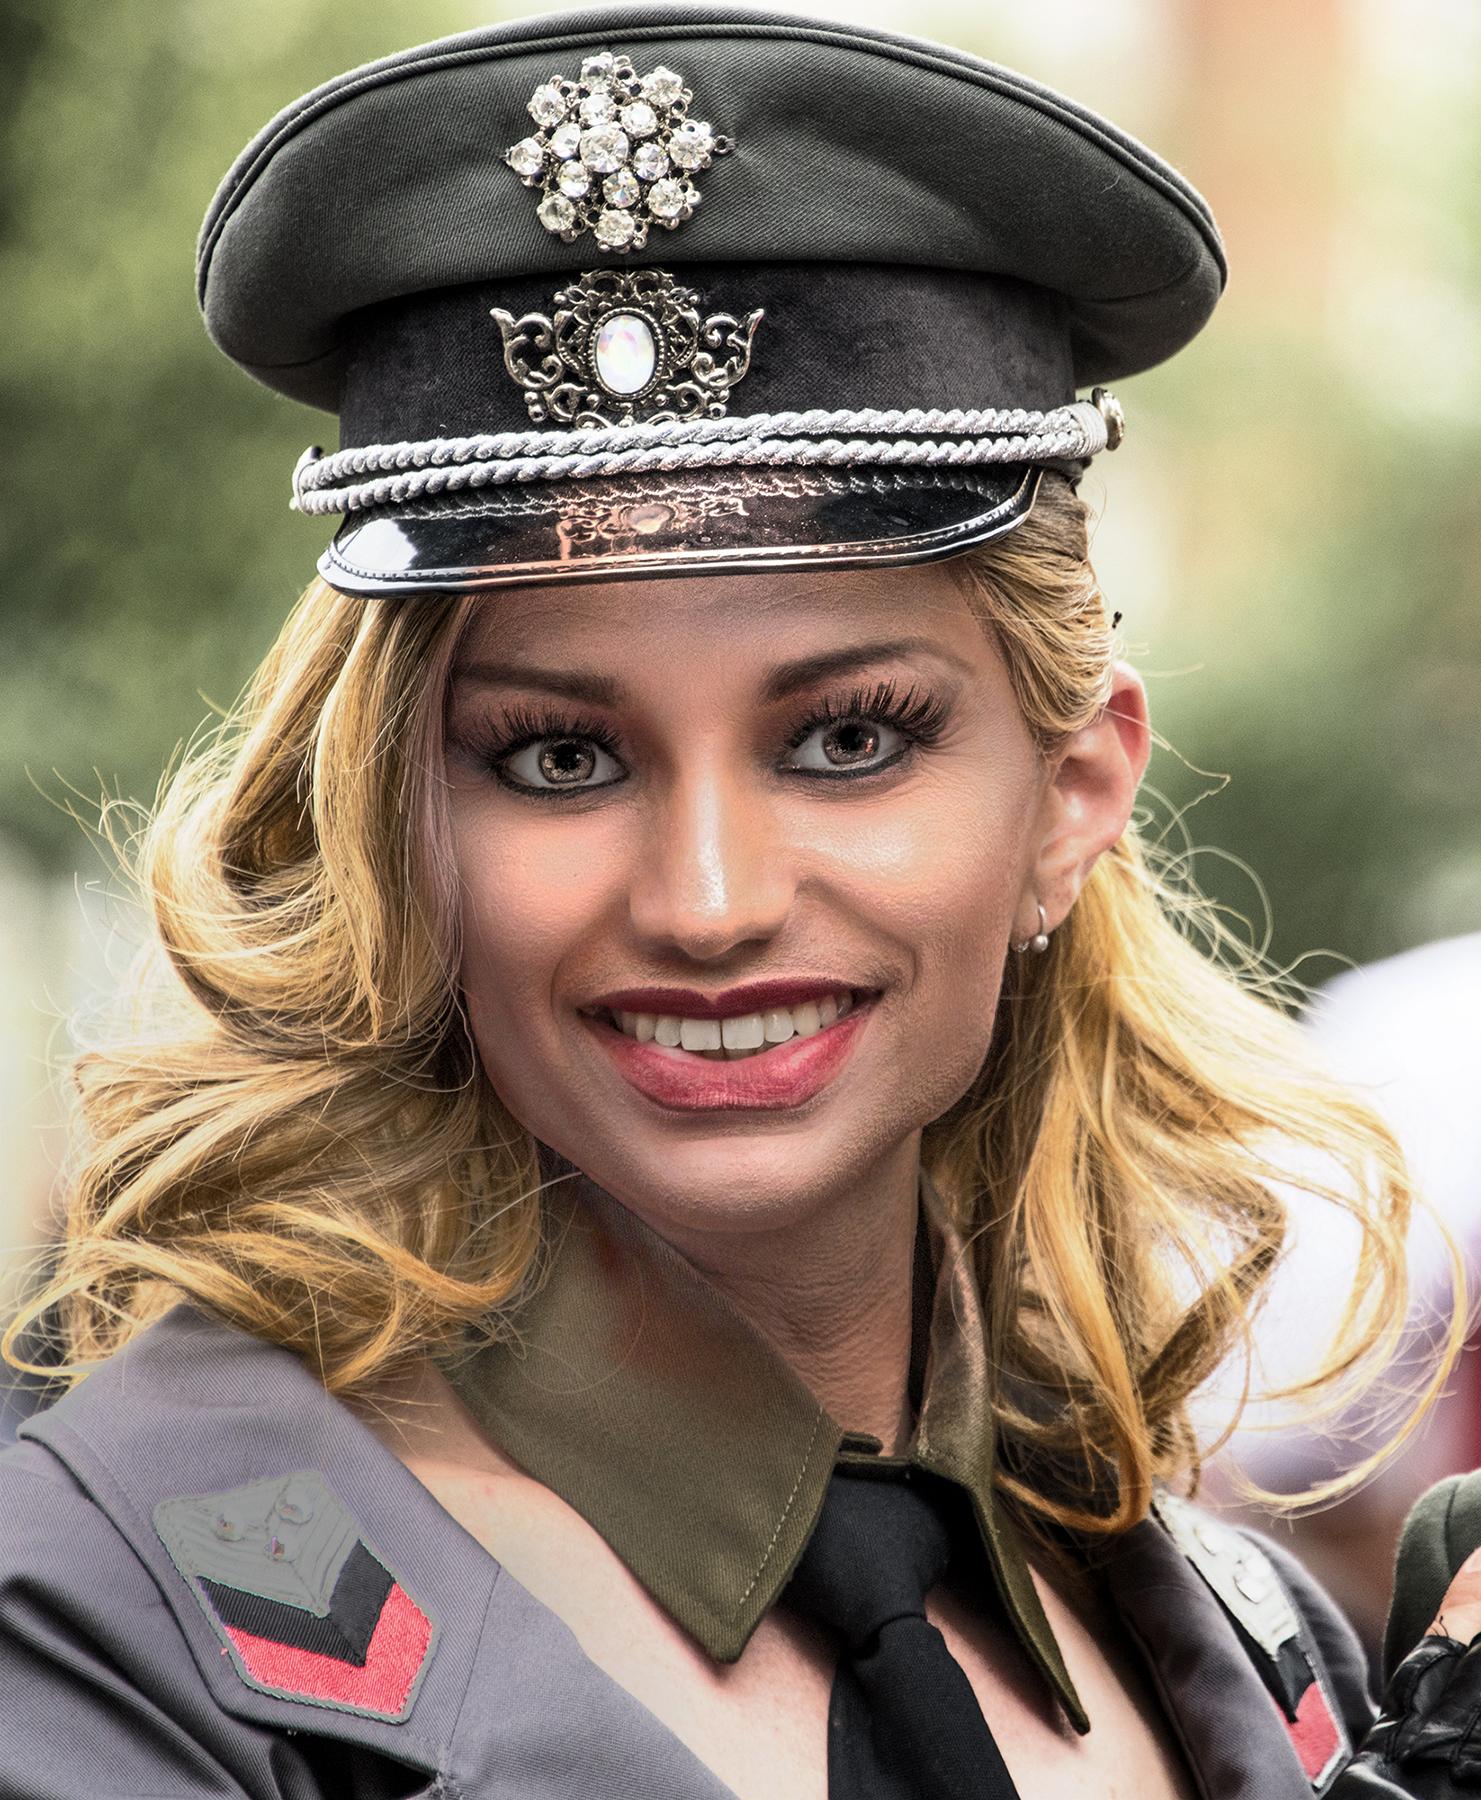 MICHAEL_WINTERS_VIENNA_PARADE_PARTICIPANT_LGBT_MARCHER_1.JPG